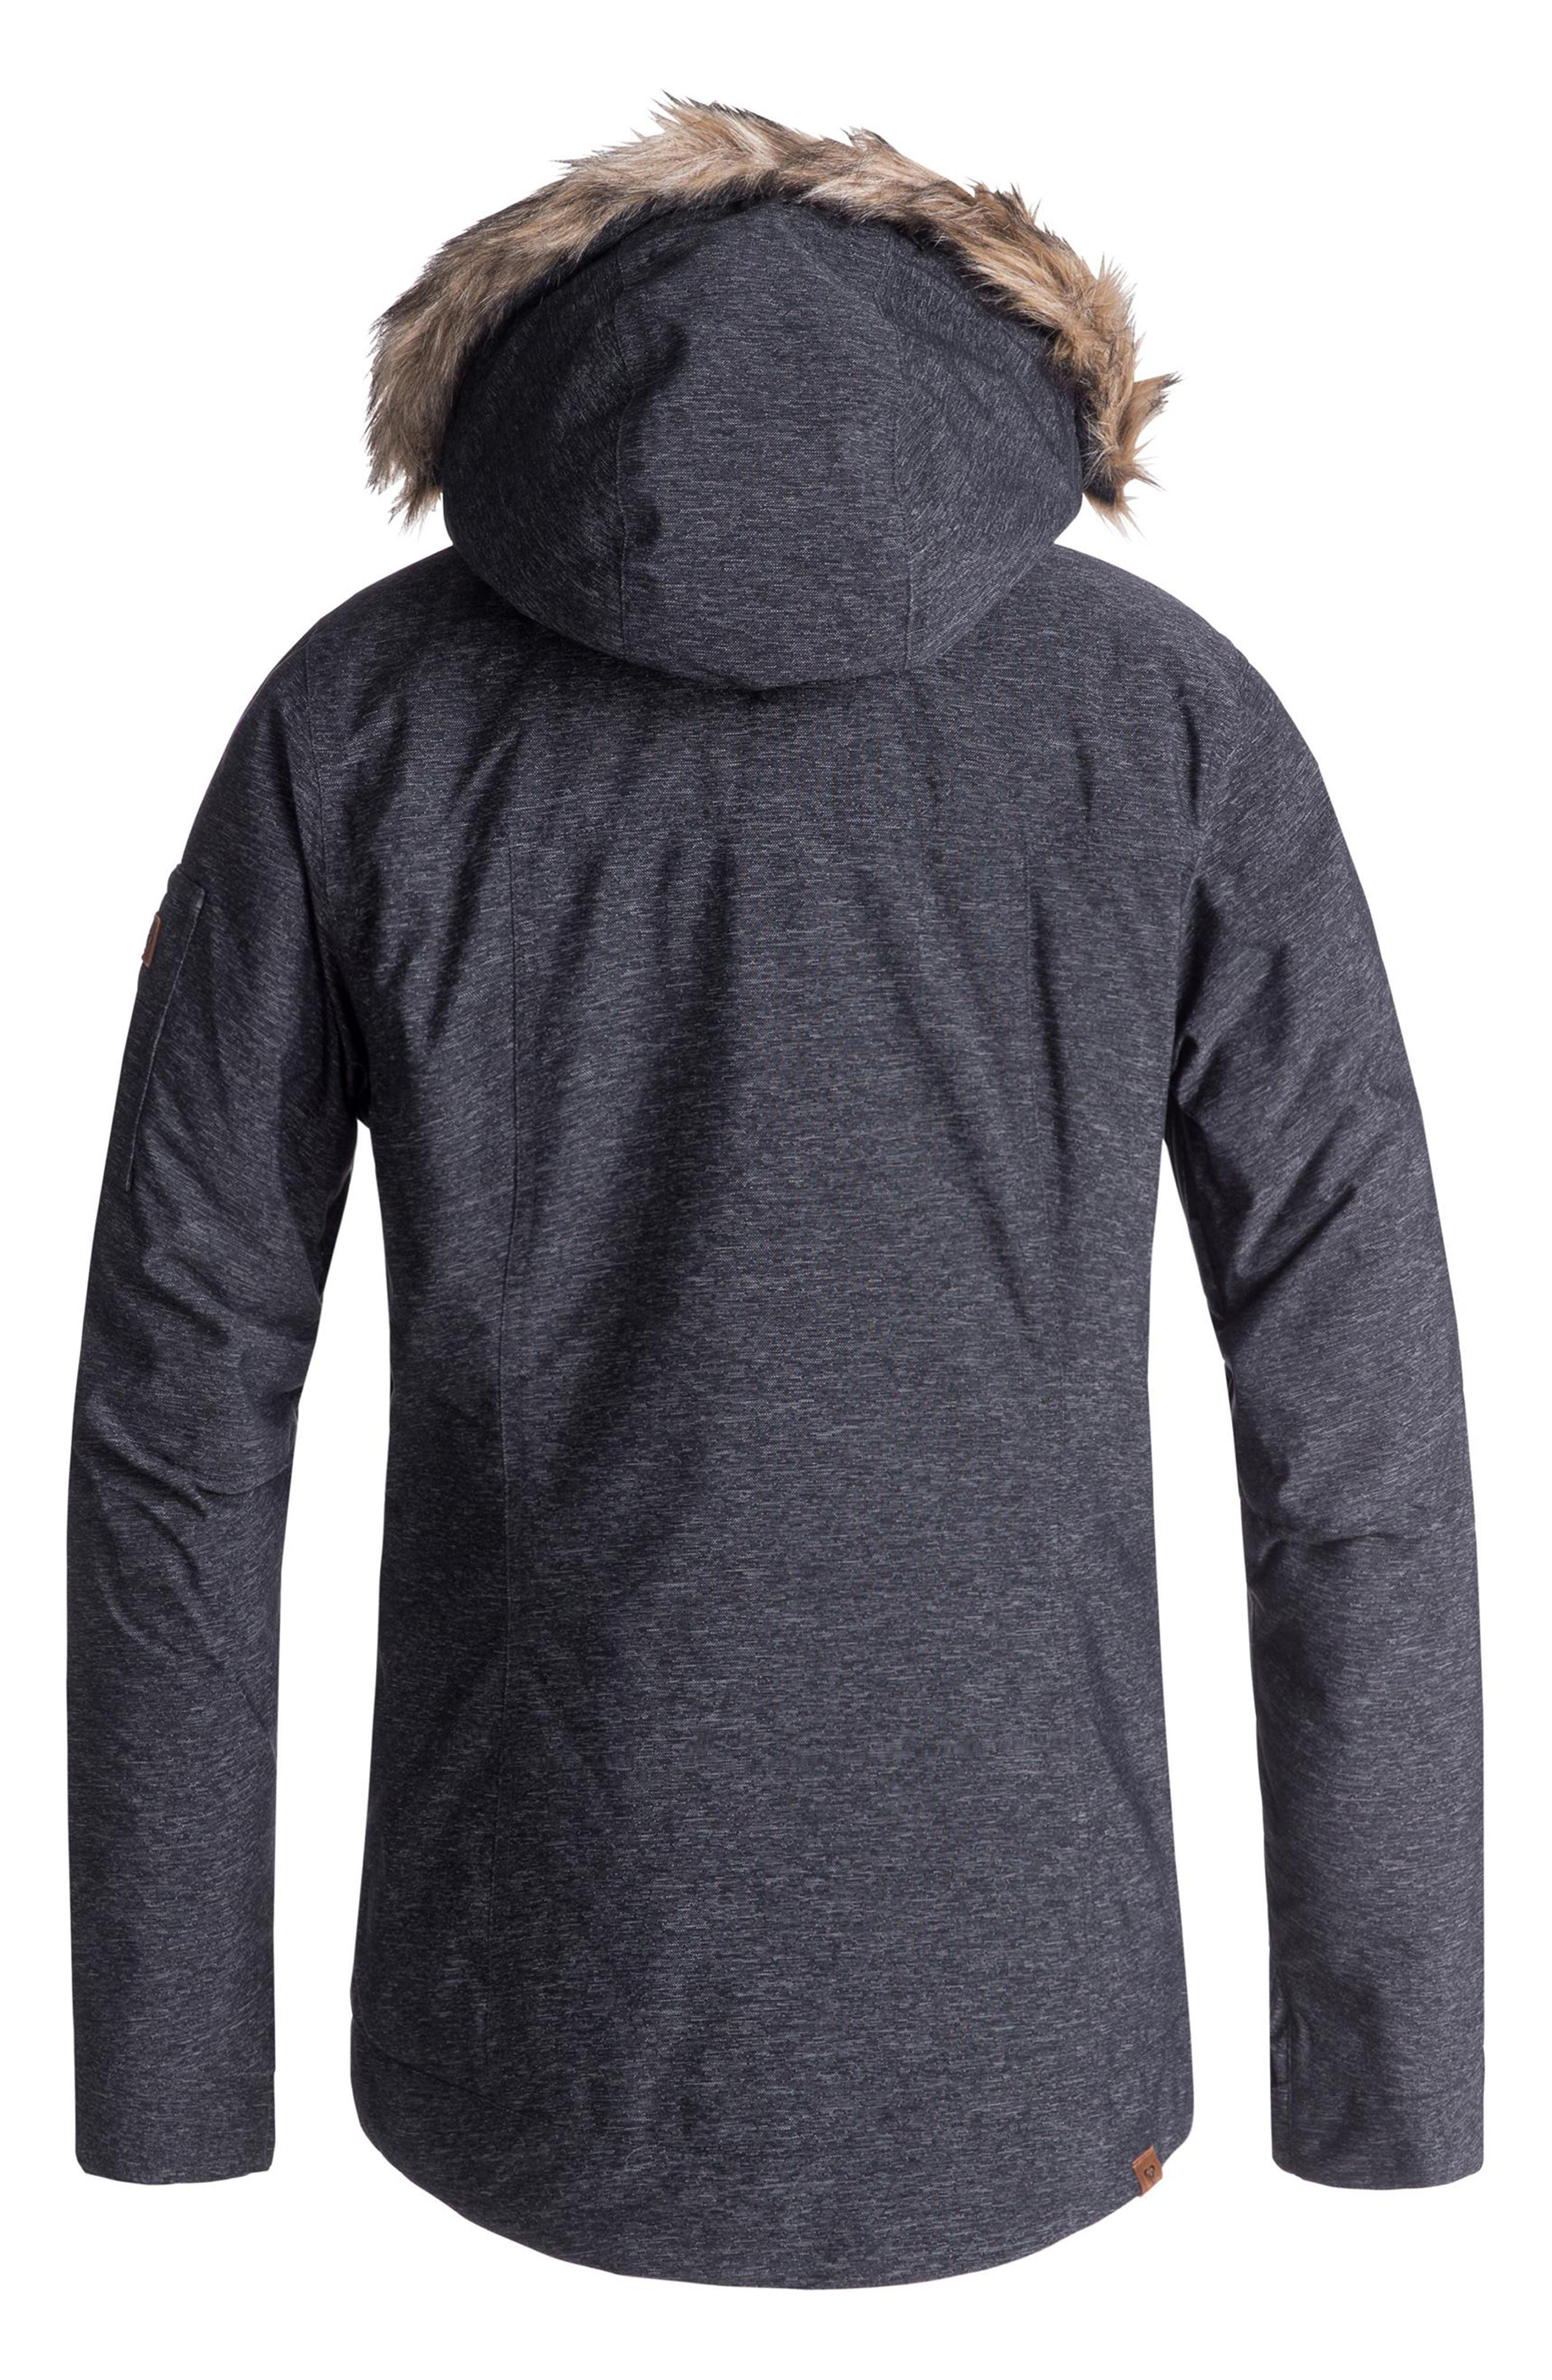 Meade Snow Jacket,                             Alternate thumbnail 3, color,                             002